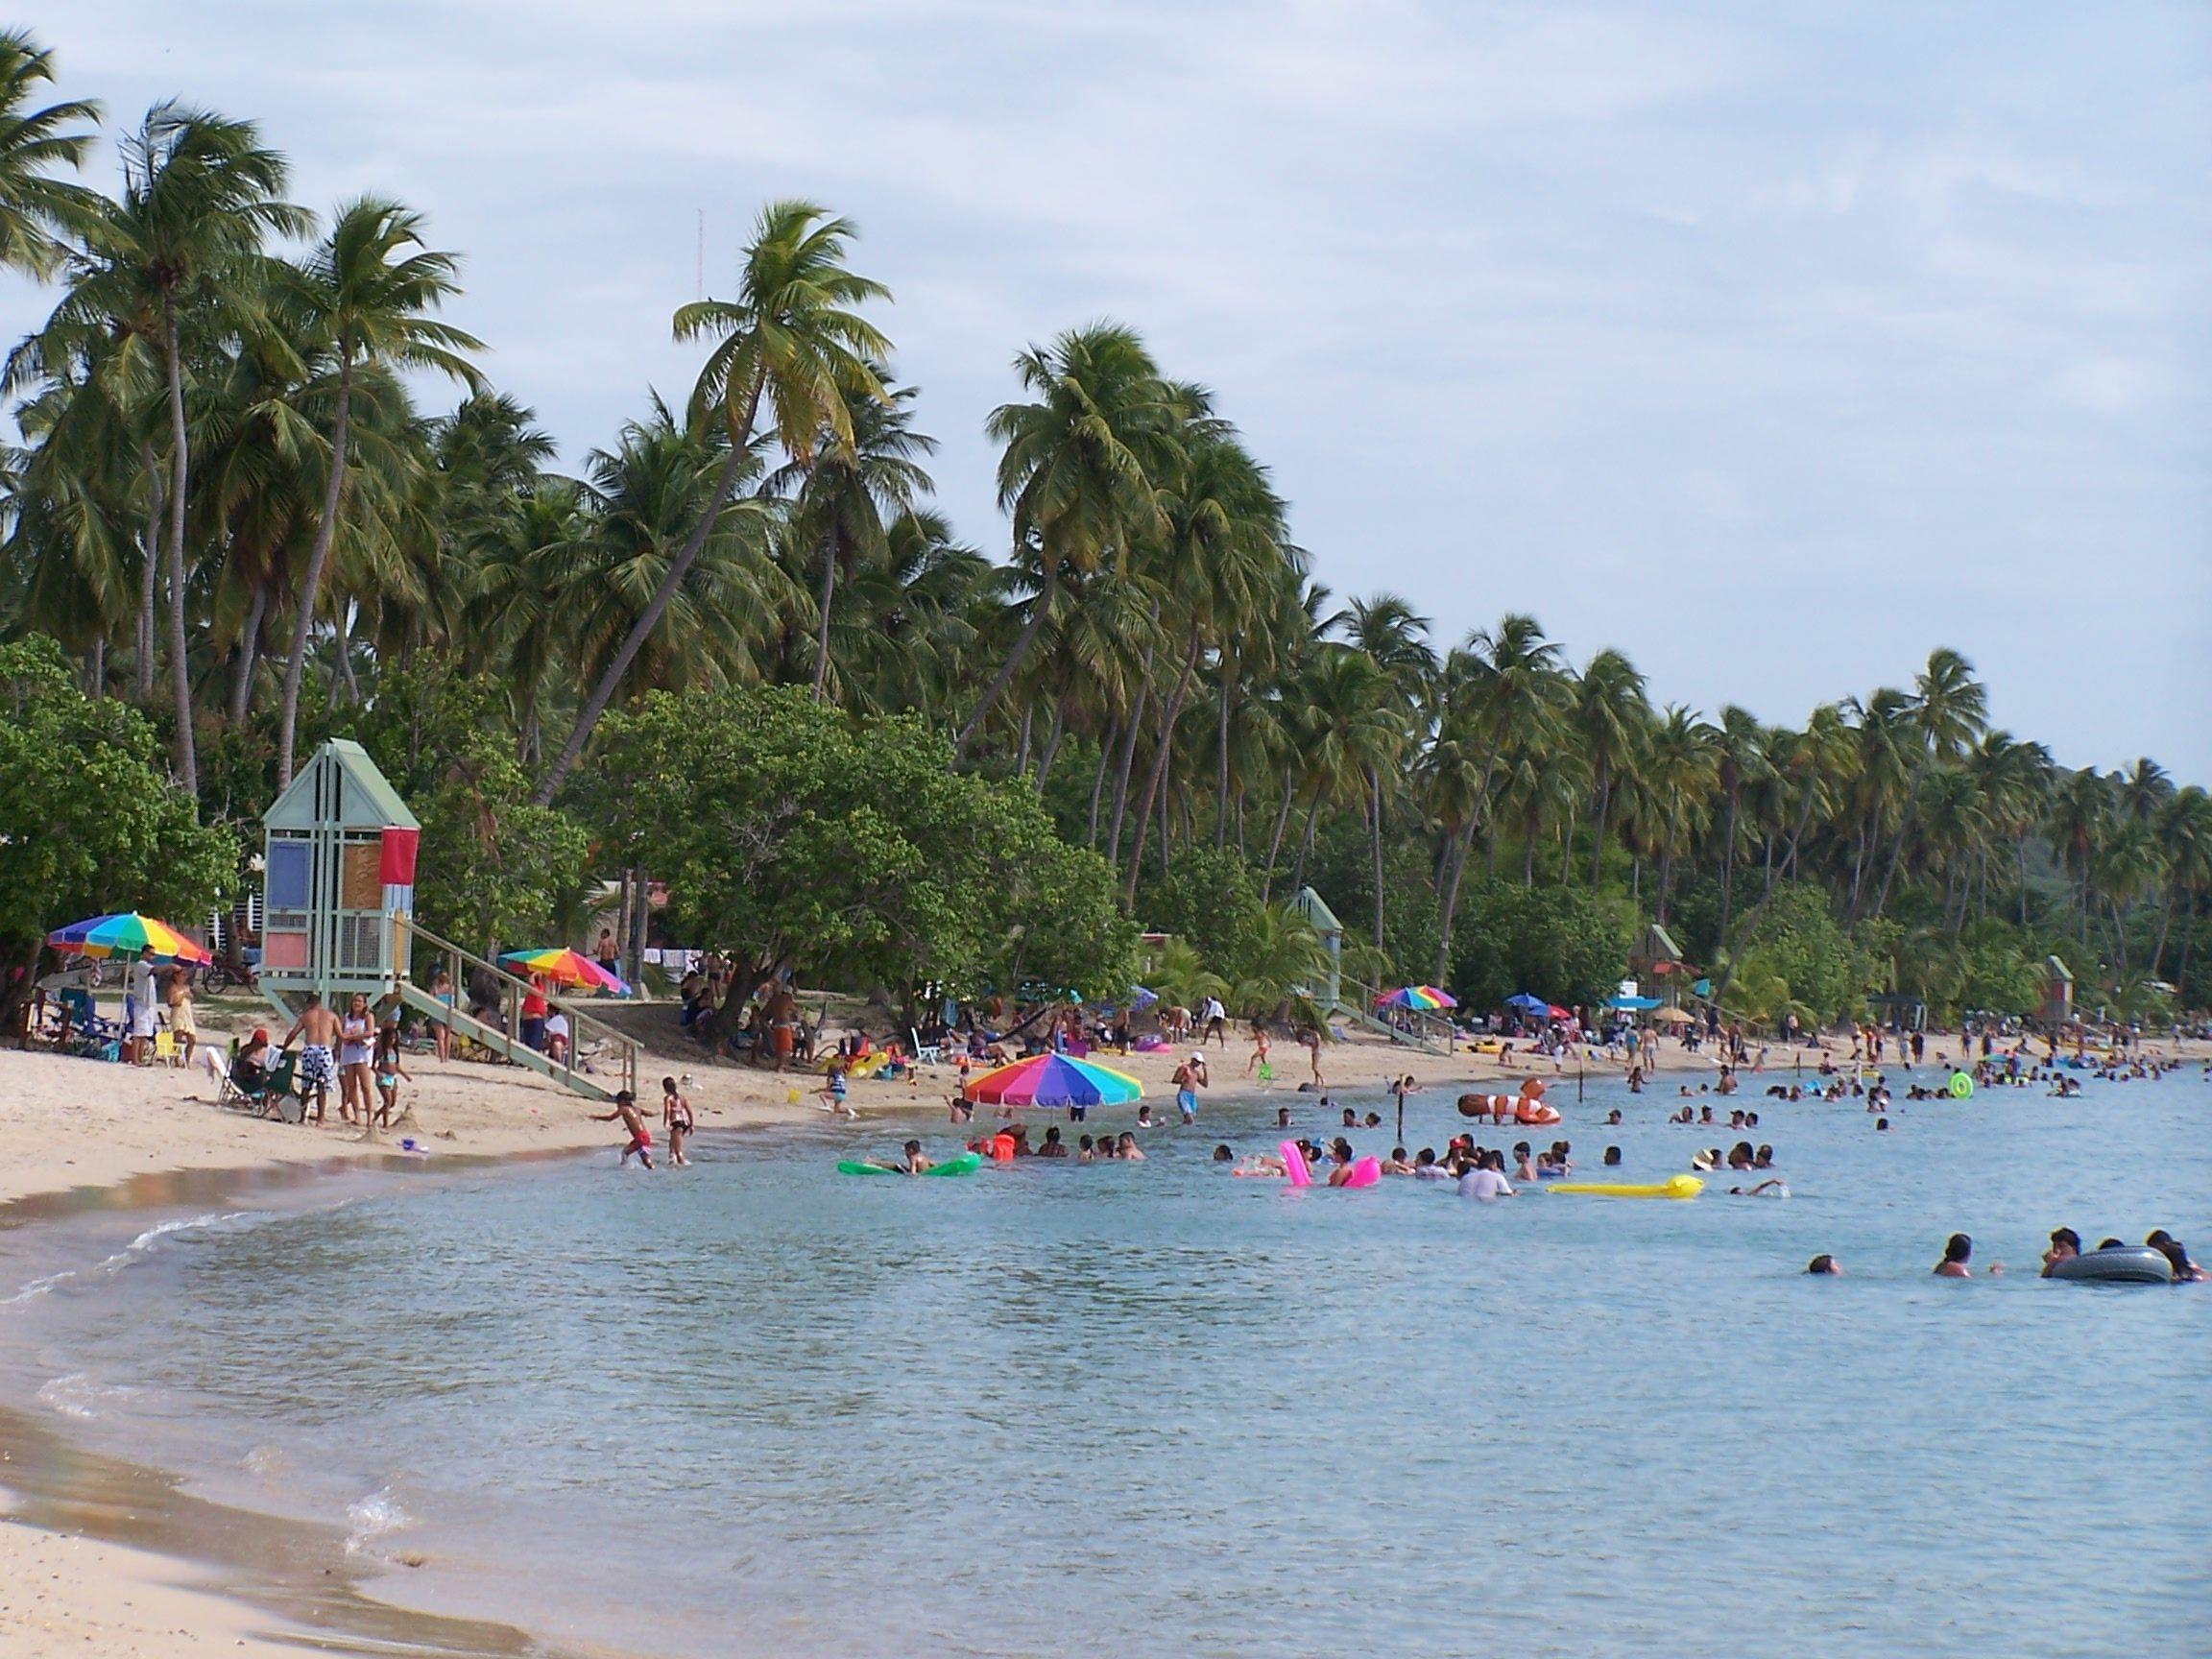 La playa de boqueron this is where i am from cabo rojo for Villas koralina combate cabo rojo